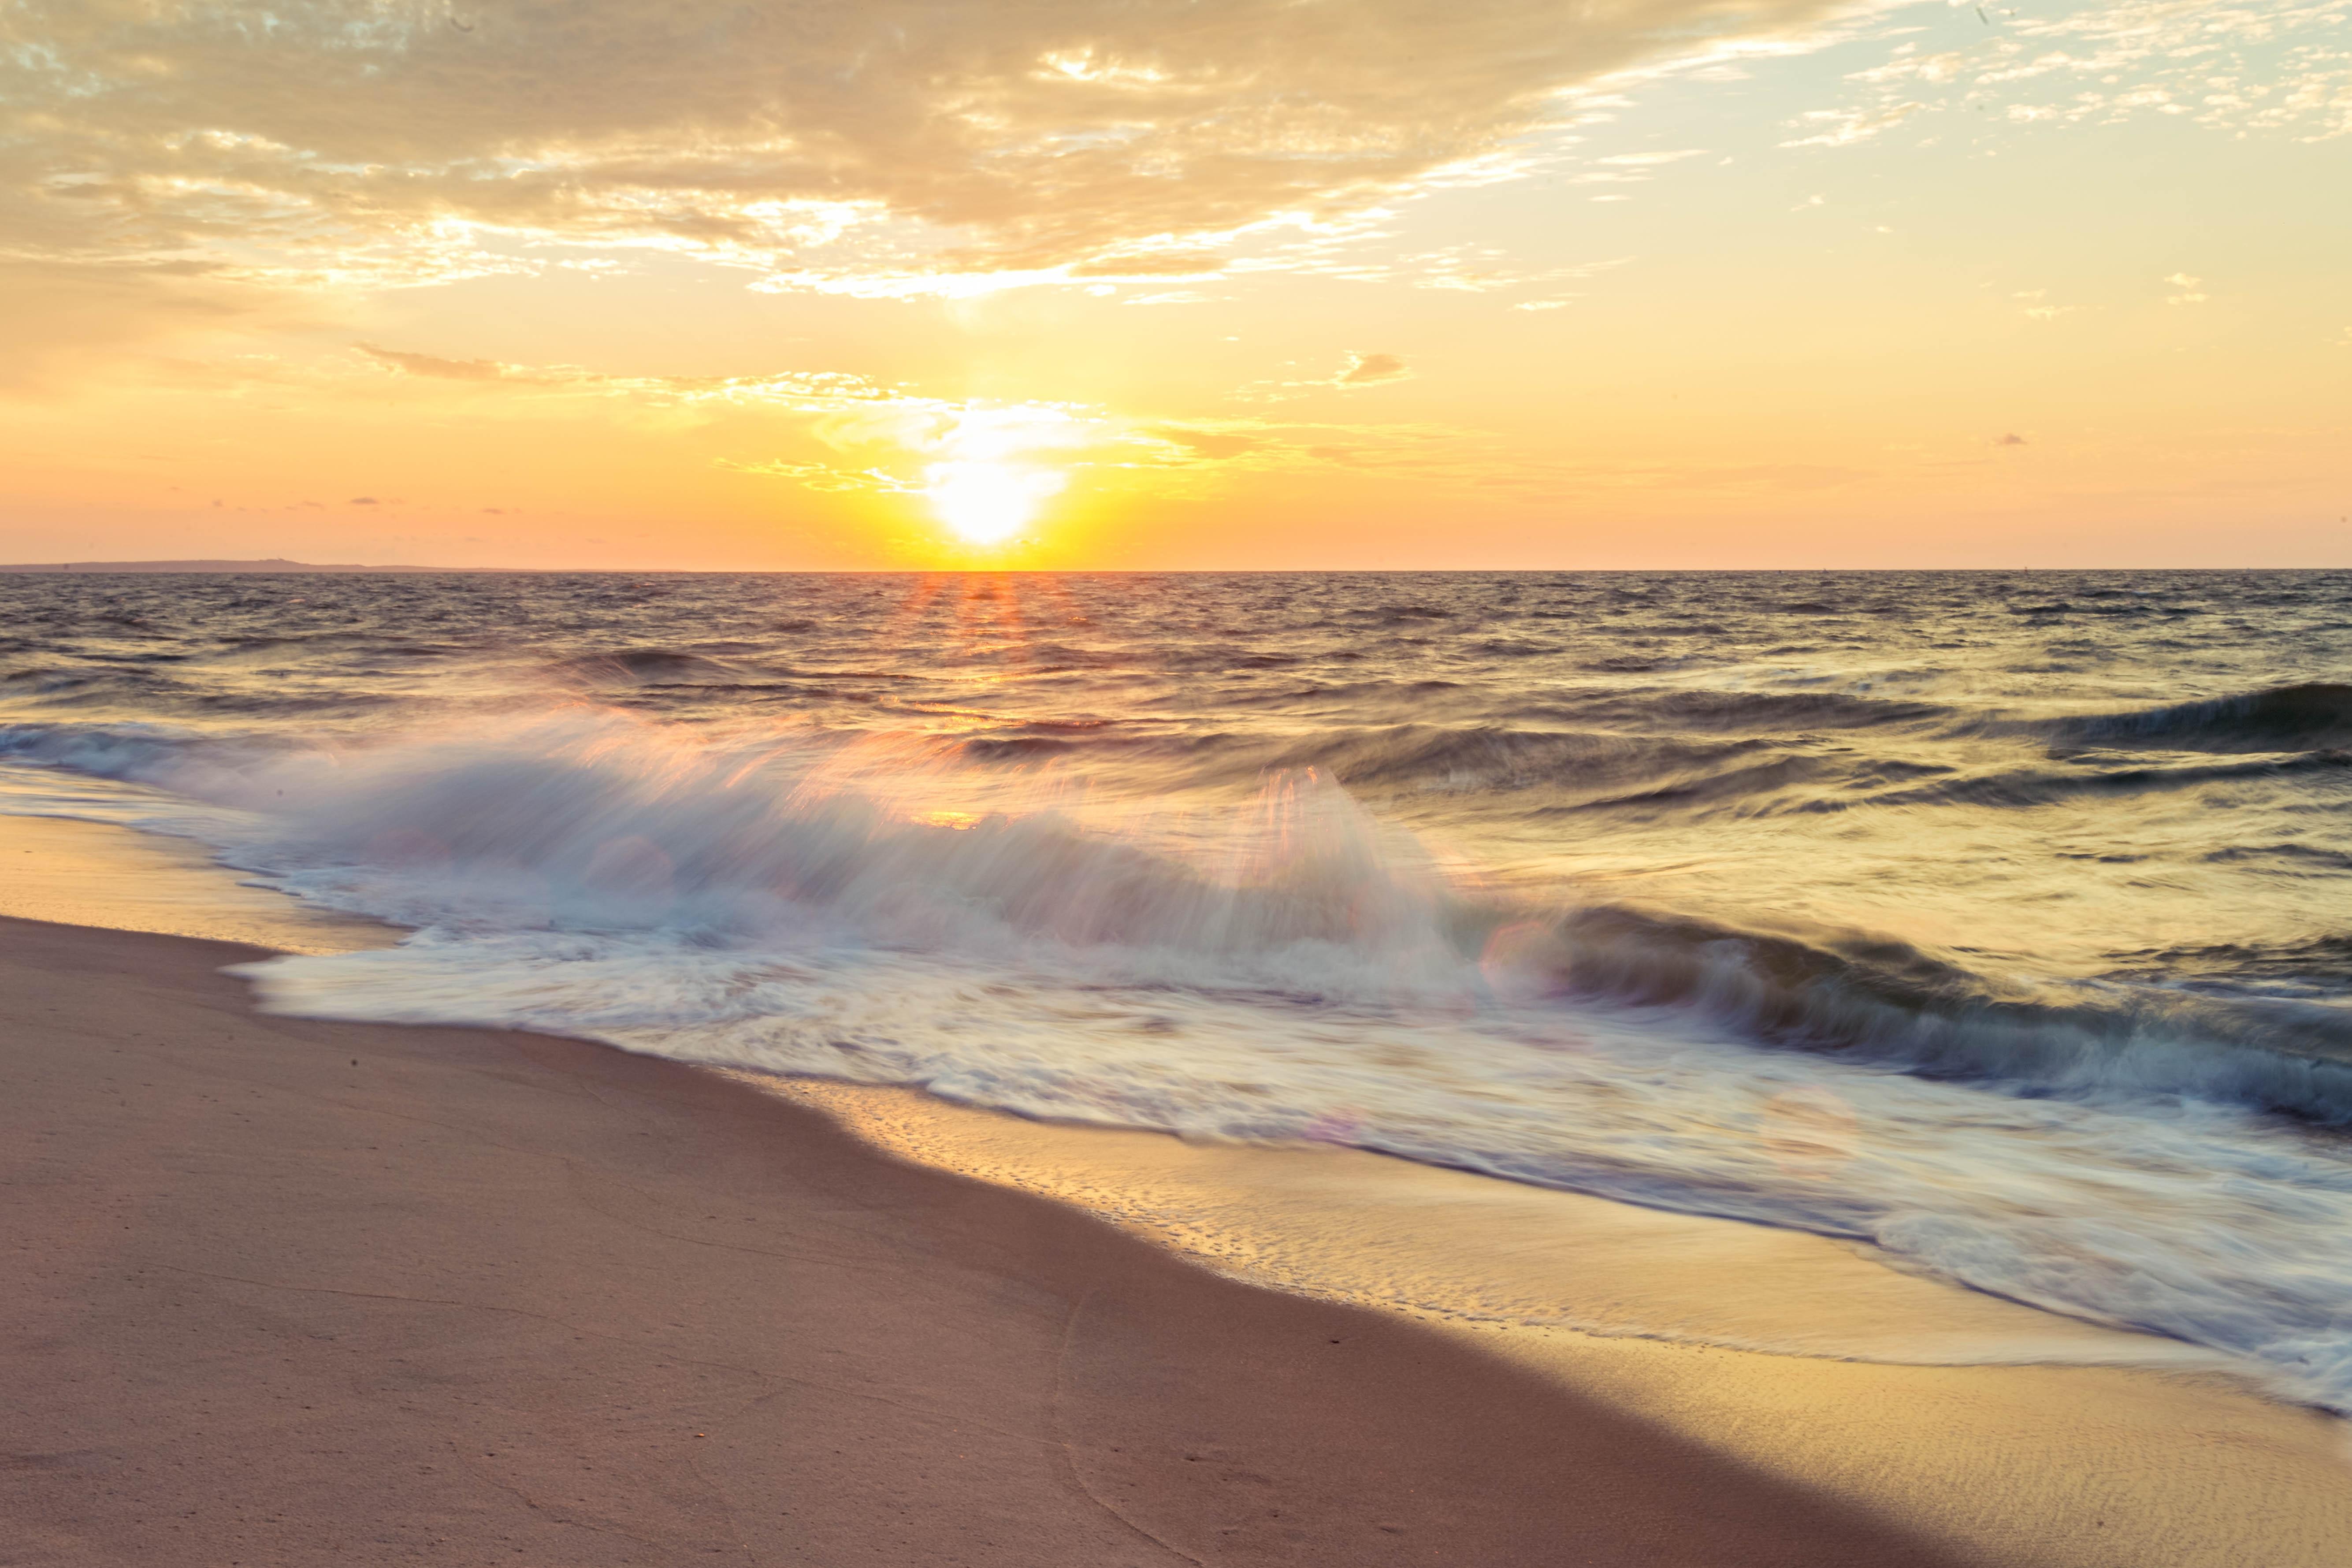 Gambar Pantai Alam Pasir Lautan Horison Awan Matahari Terbit